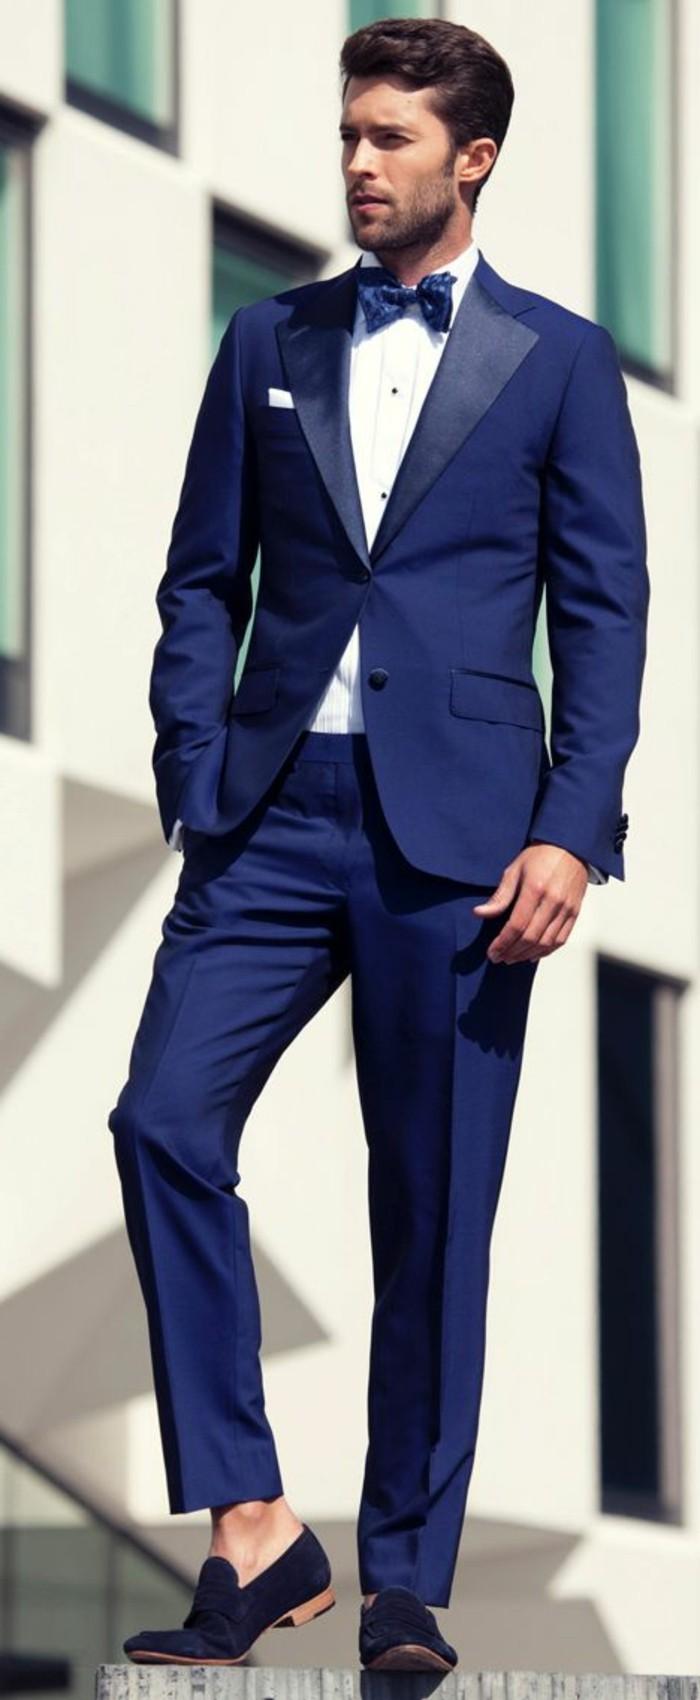 tenue-classe-homme-tenue-mariage-invité-bleu